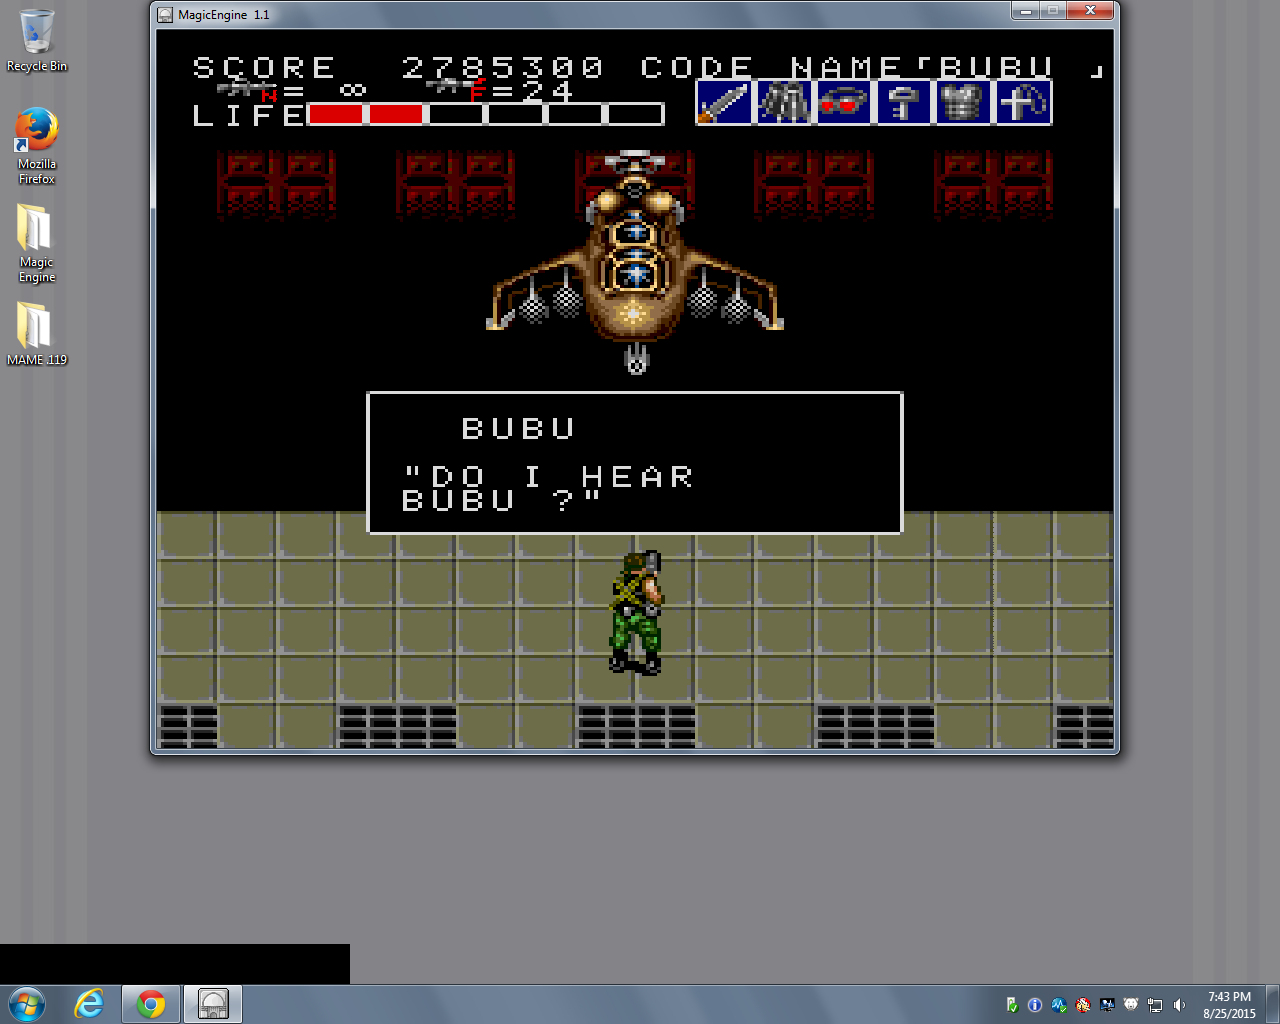 bubufubu: Bloody Wolf (TurboGrafx-16/PC Engine Emulated) 2,785,300 points on 2015-10-22 16:39:33